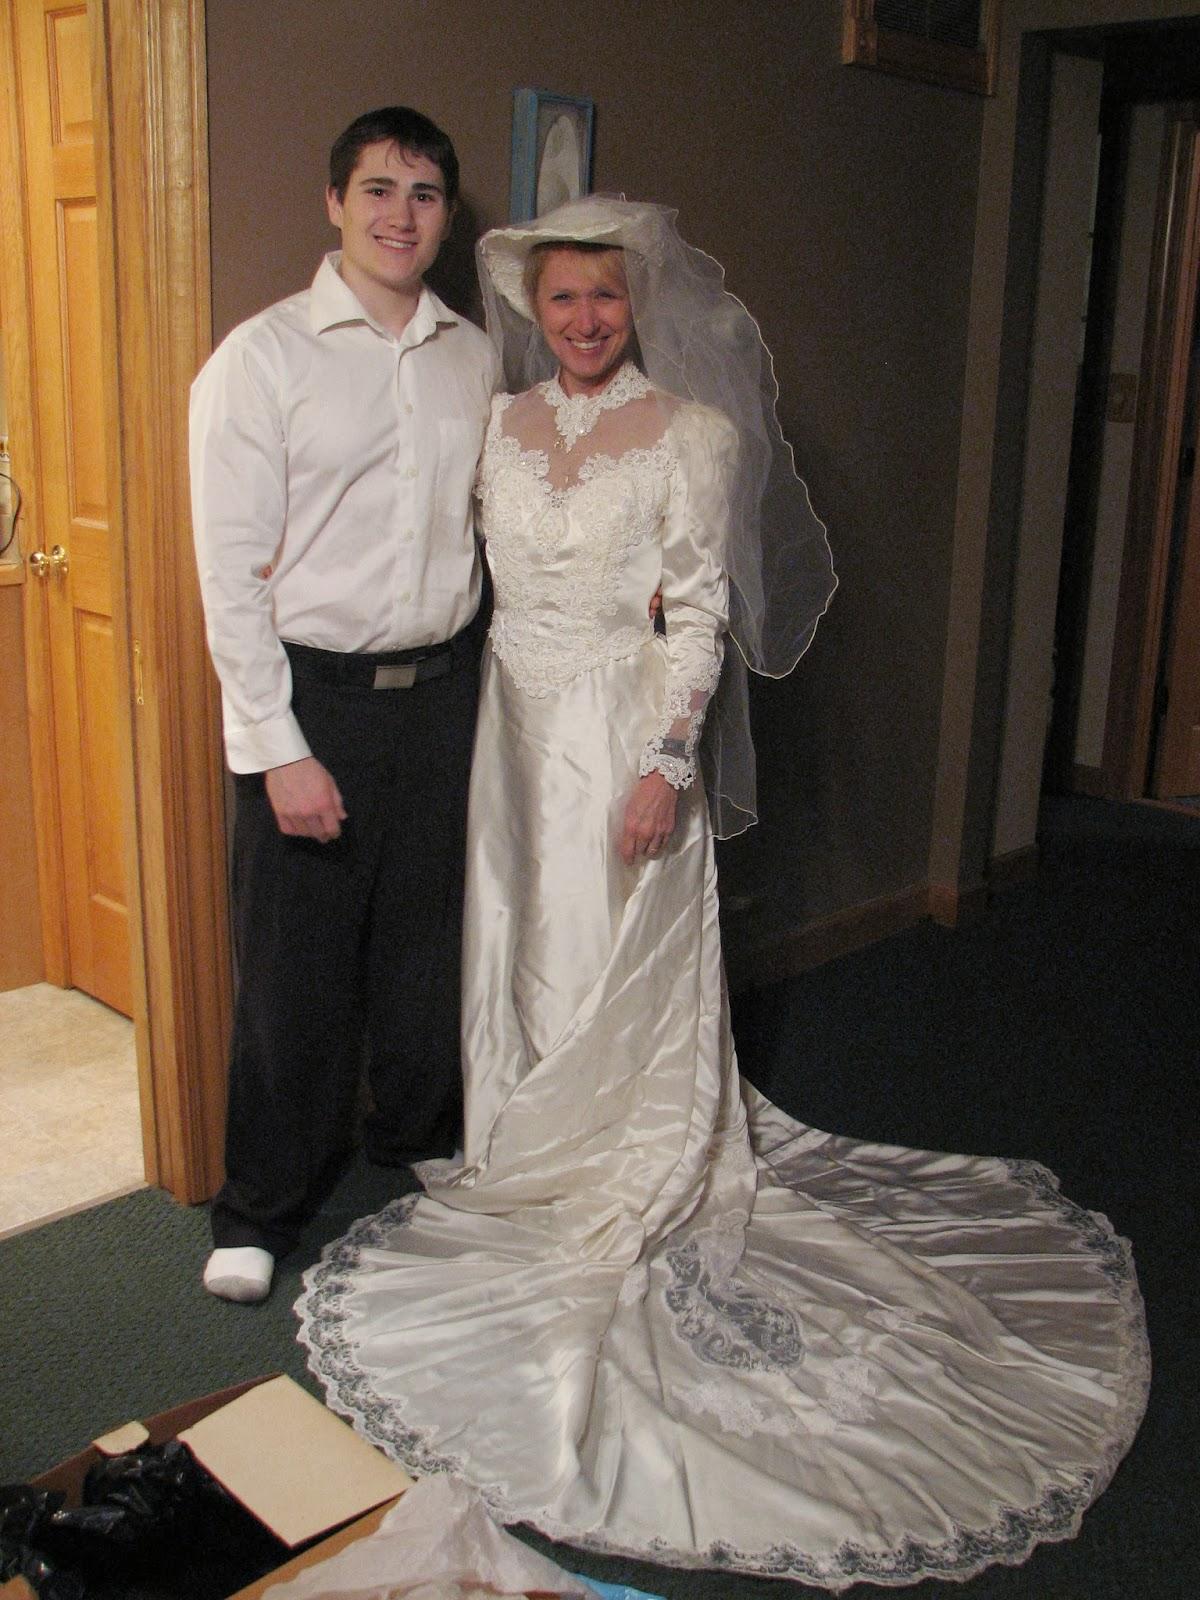 worst wedding dress pictures - HD1200×1600